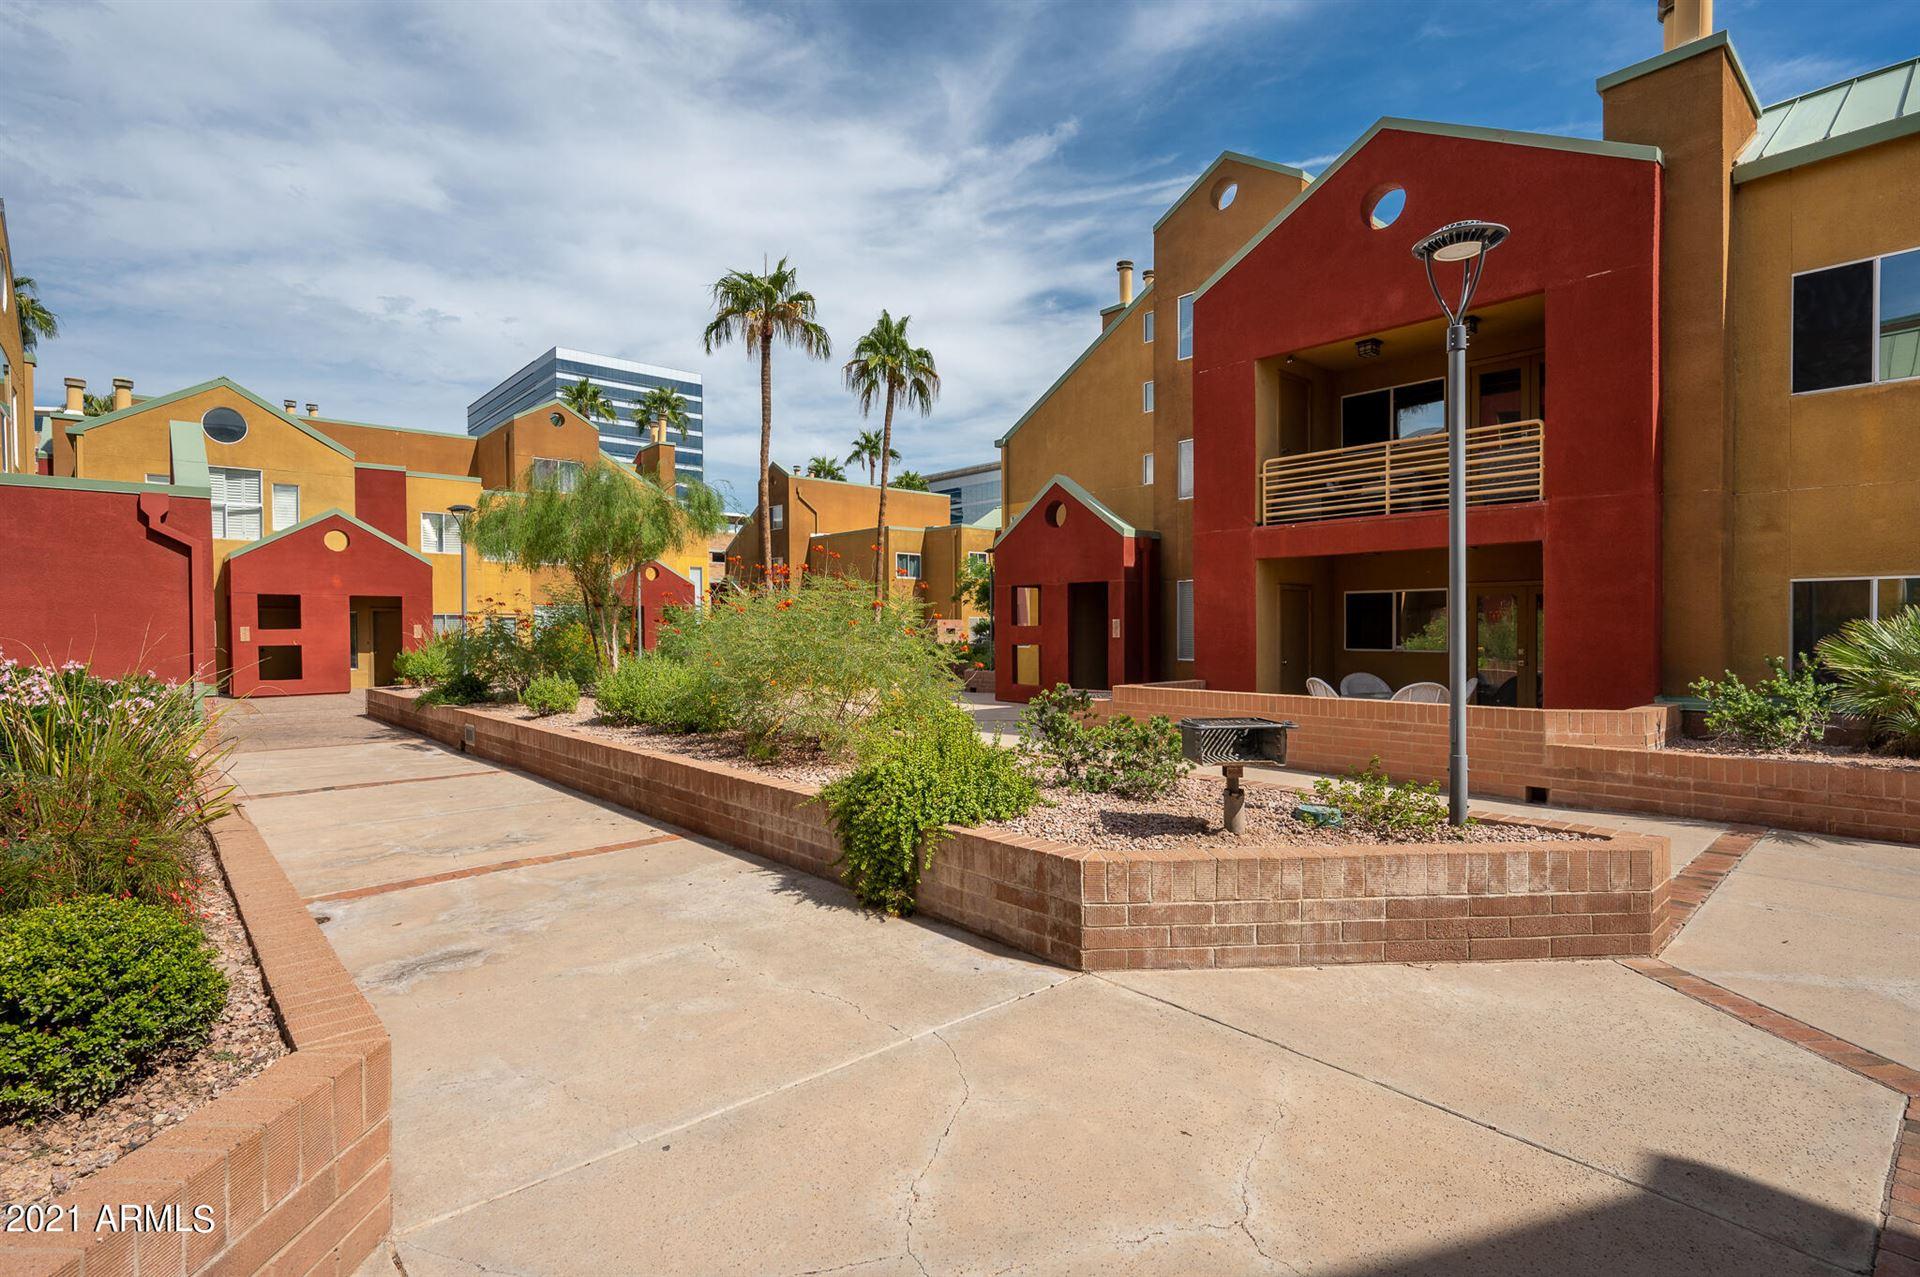 Photo of 154 W 5TH Street #205, Tempe, AZ 85281 (MLS # 6310340)